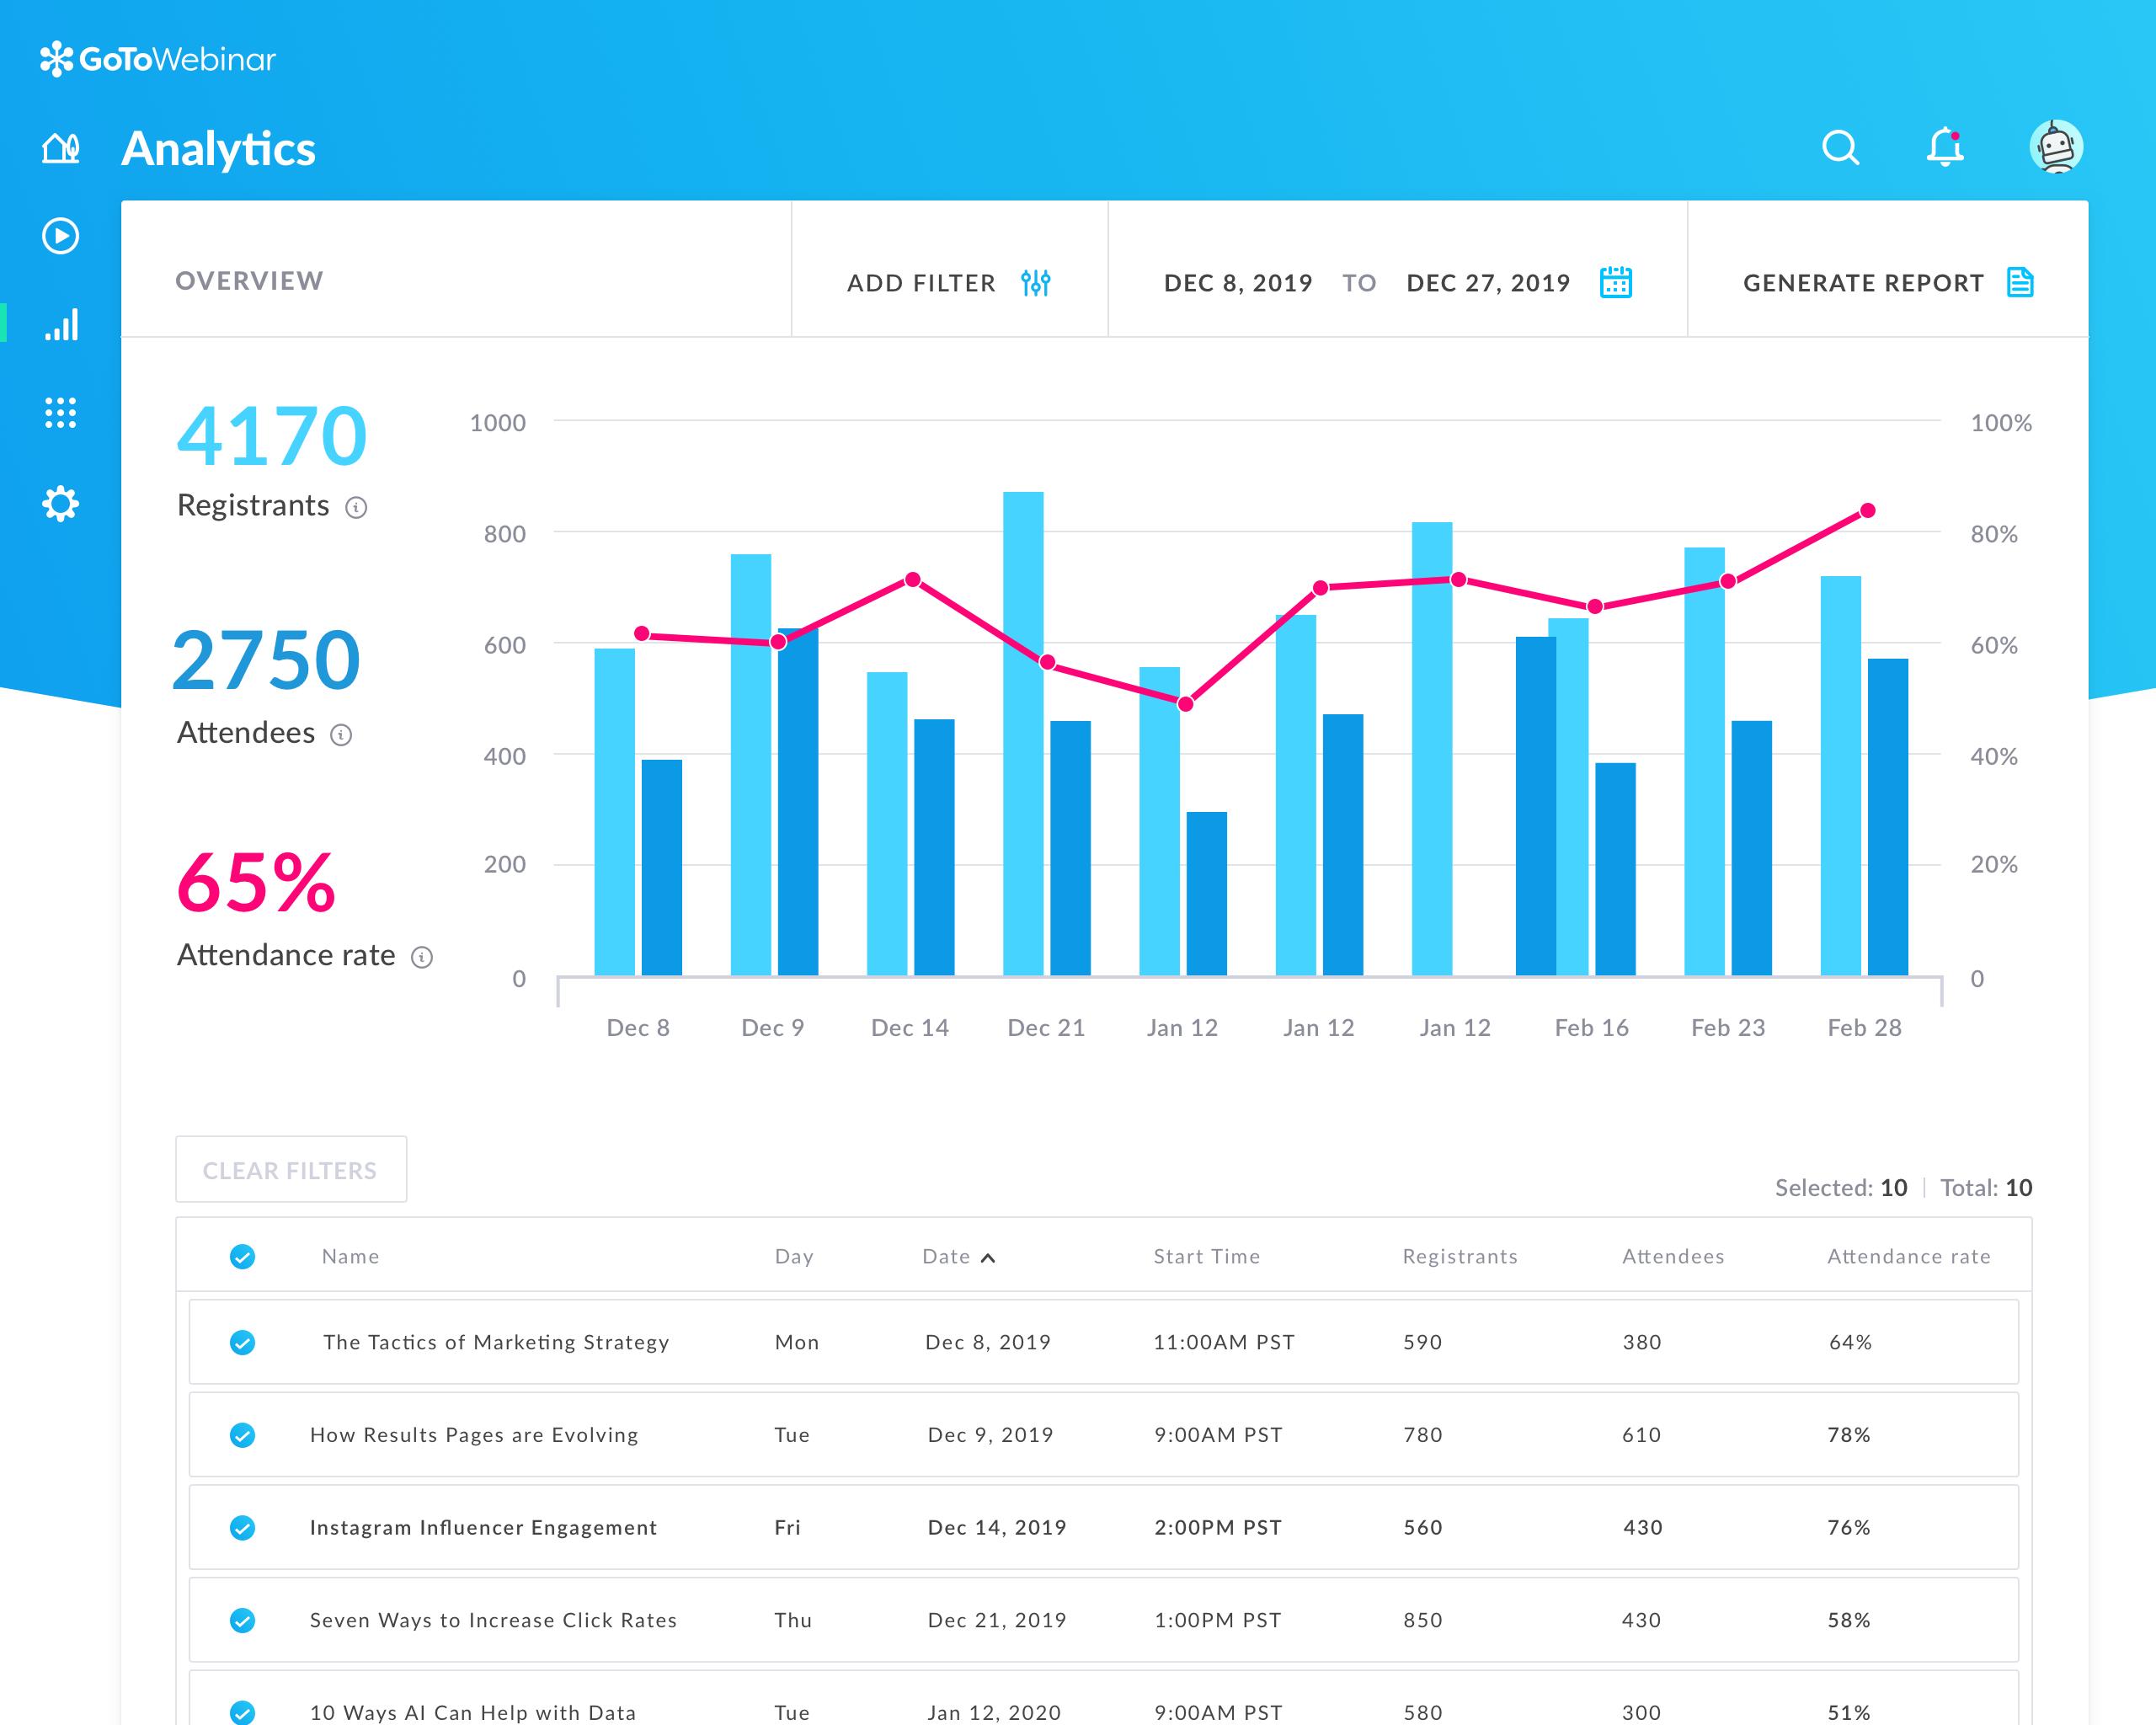 GoToWebinar analytics